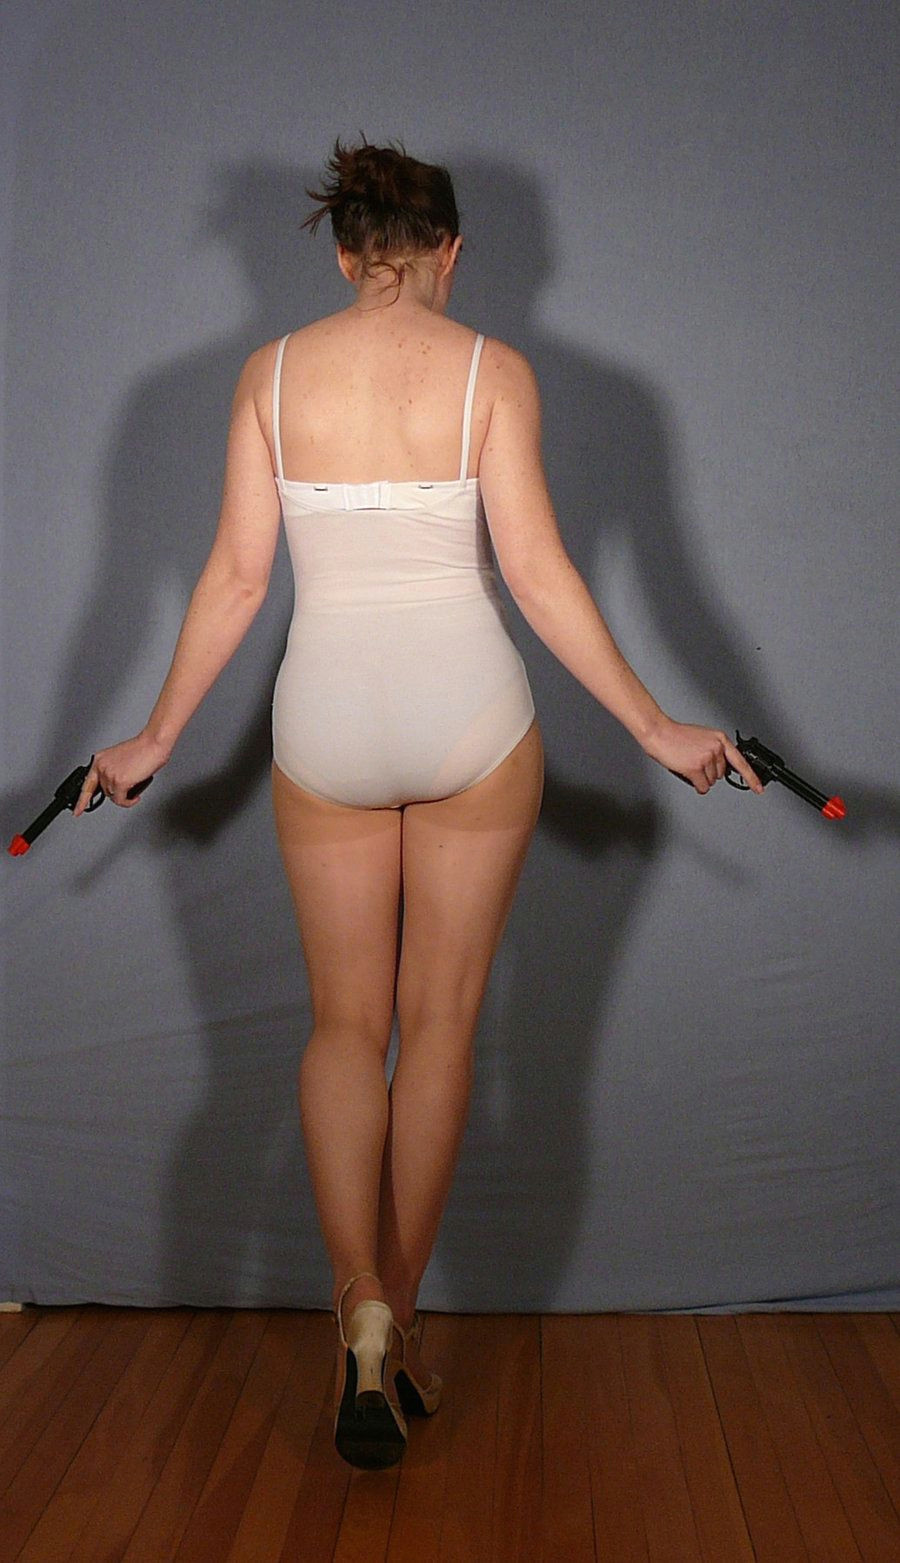 walking away pose reference by senshistock on deviantart